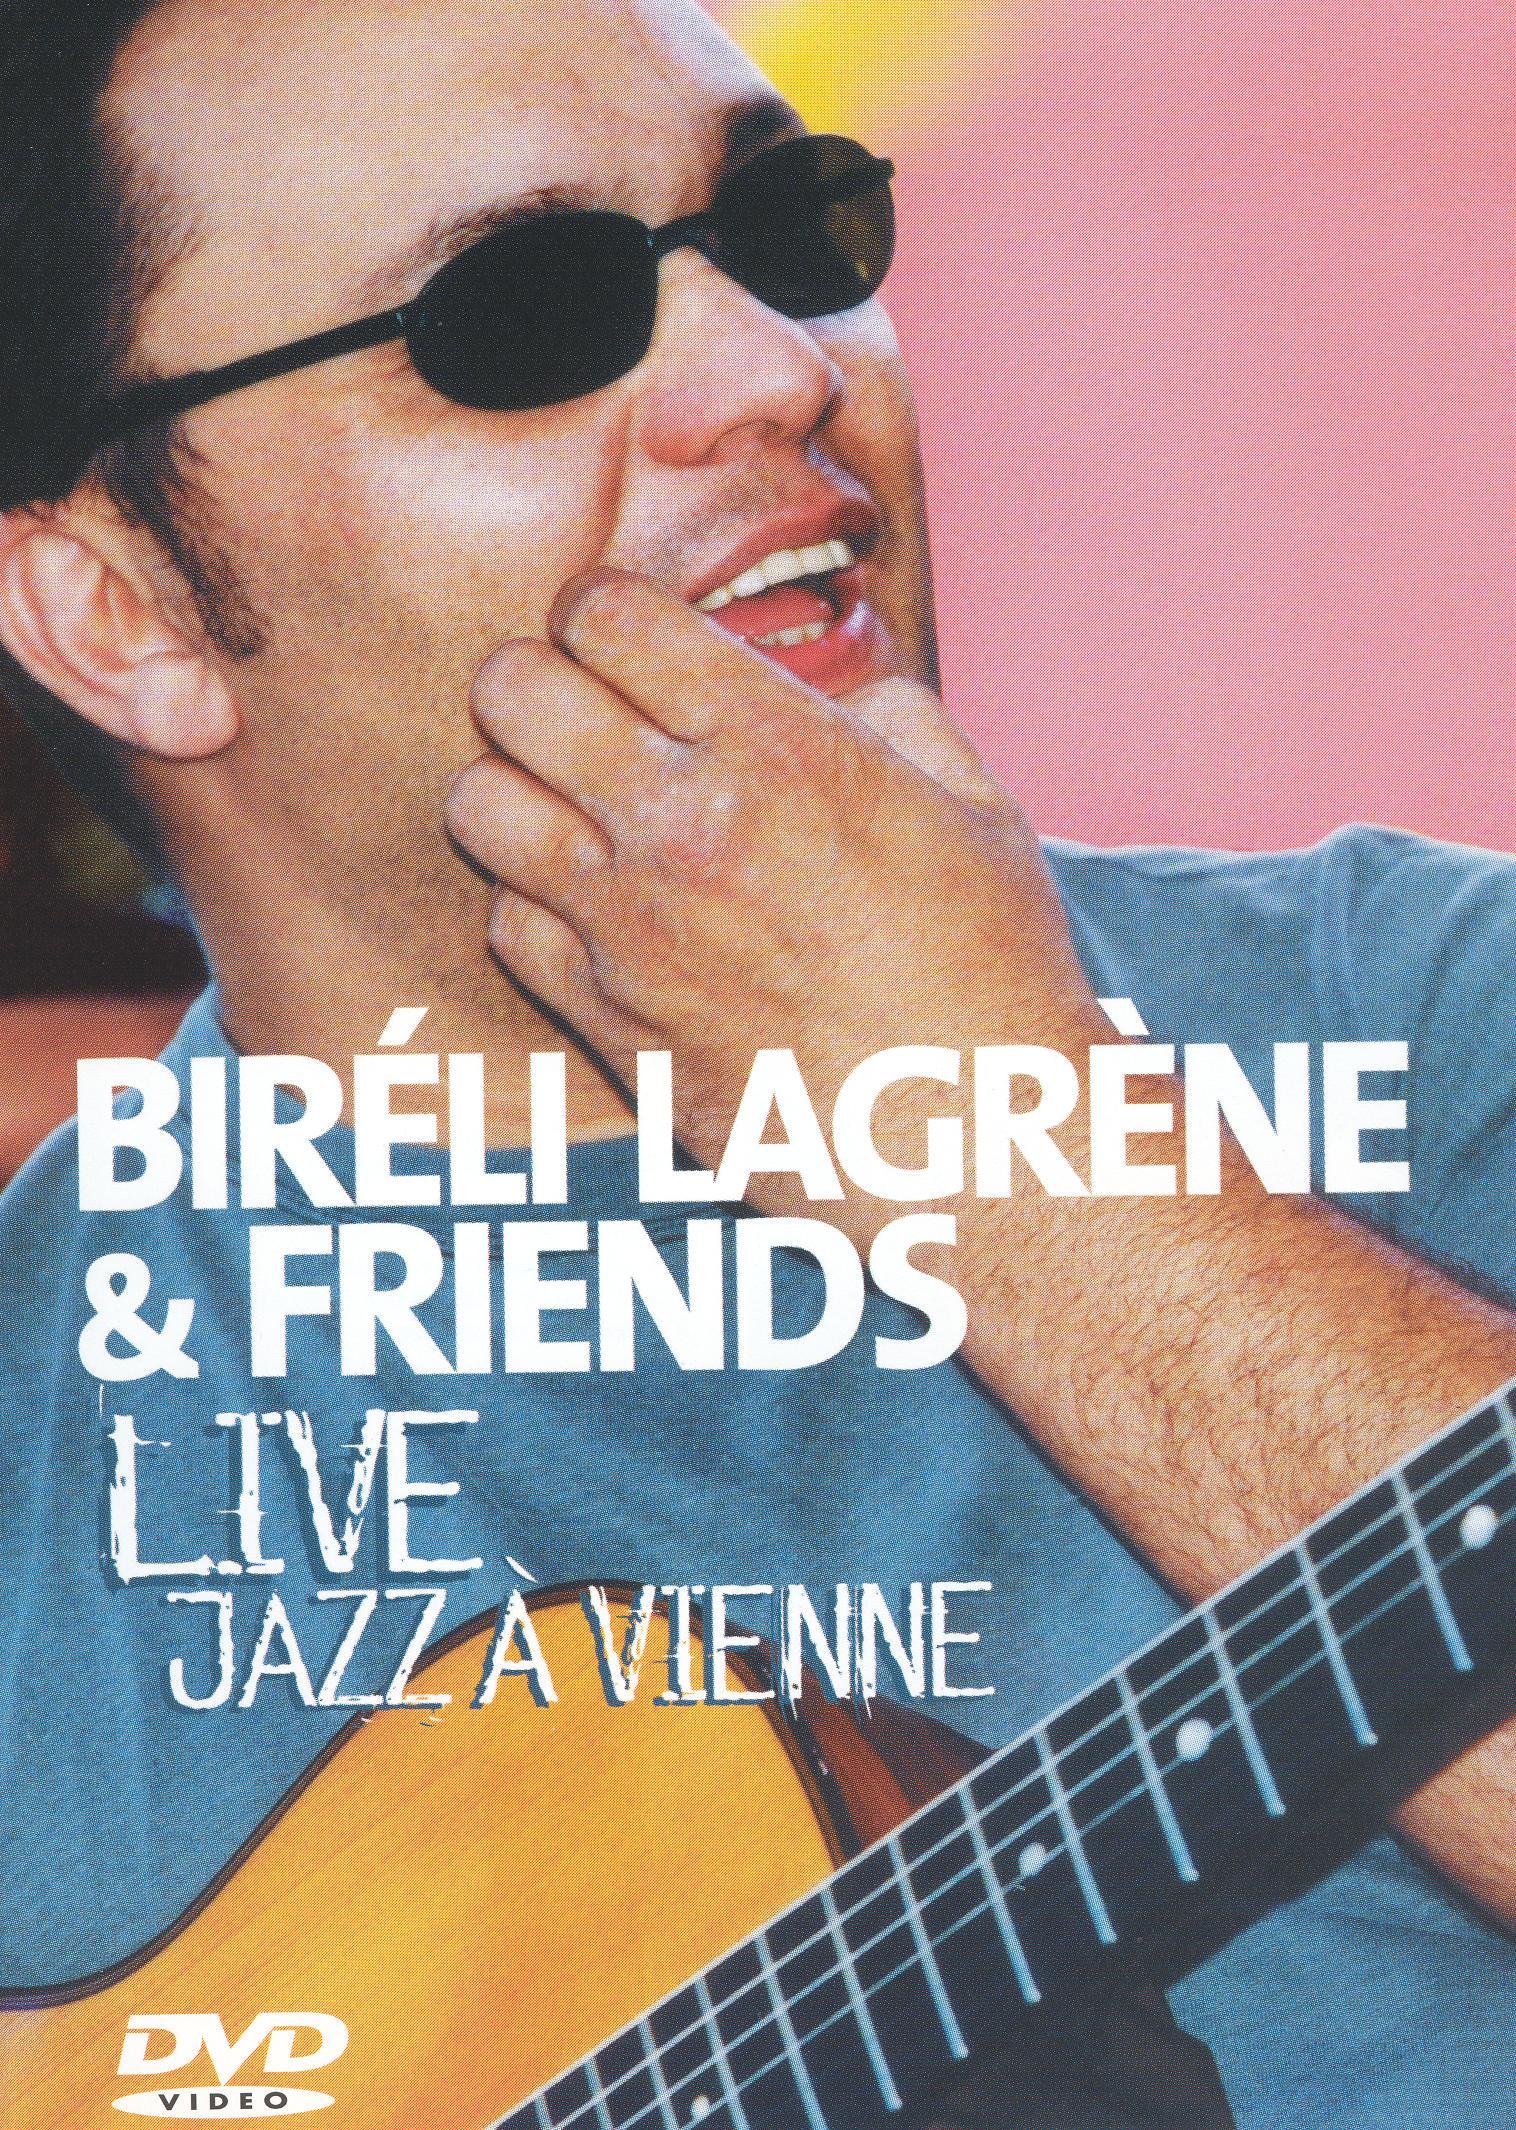 Bireli Lagrene and Friends: Live Jazz A Vienne